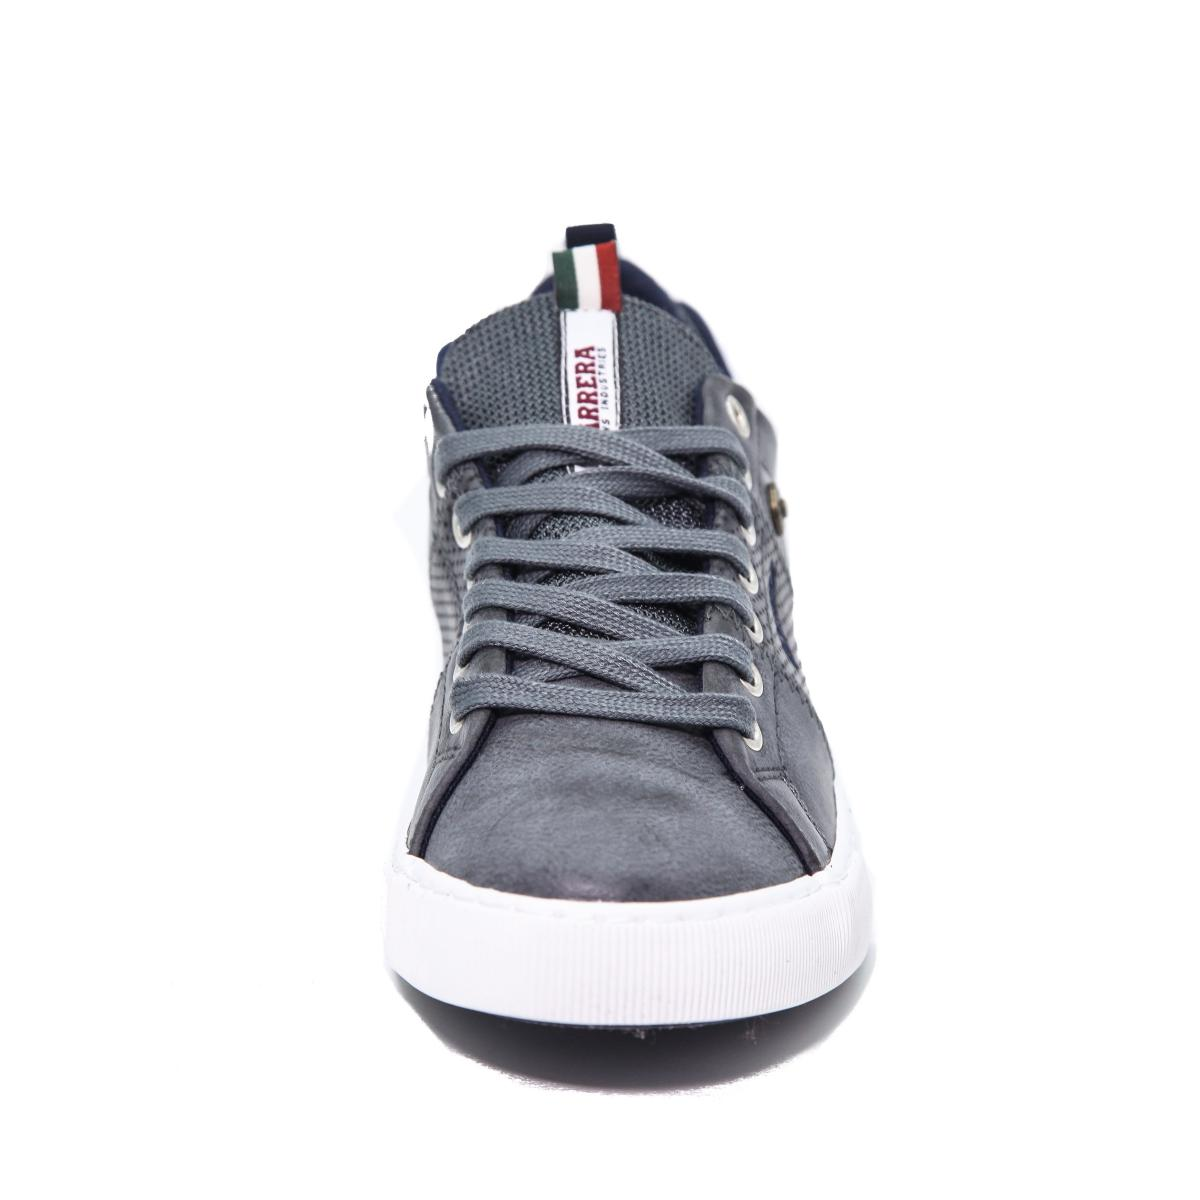 "Scarpe Sneakers ""Carrera"" Alte Da Ginnastica in Pelle Grigia da Uomo"